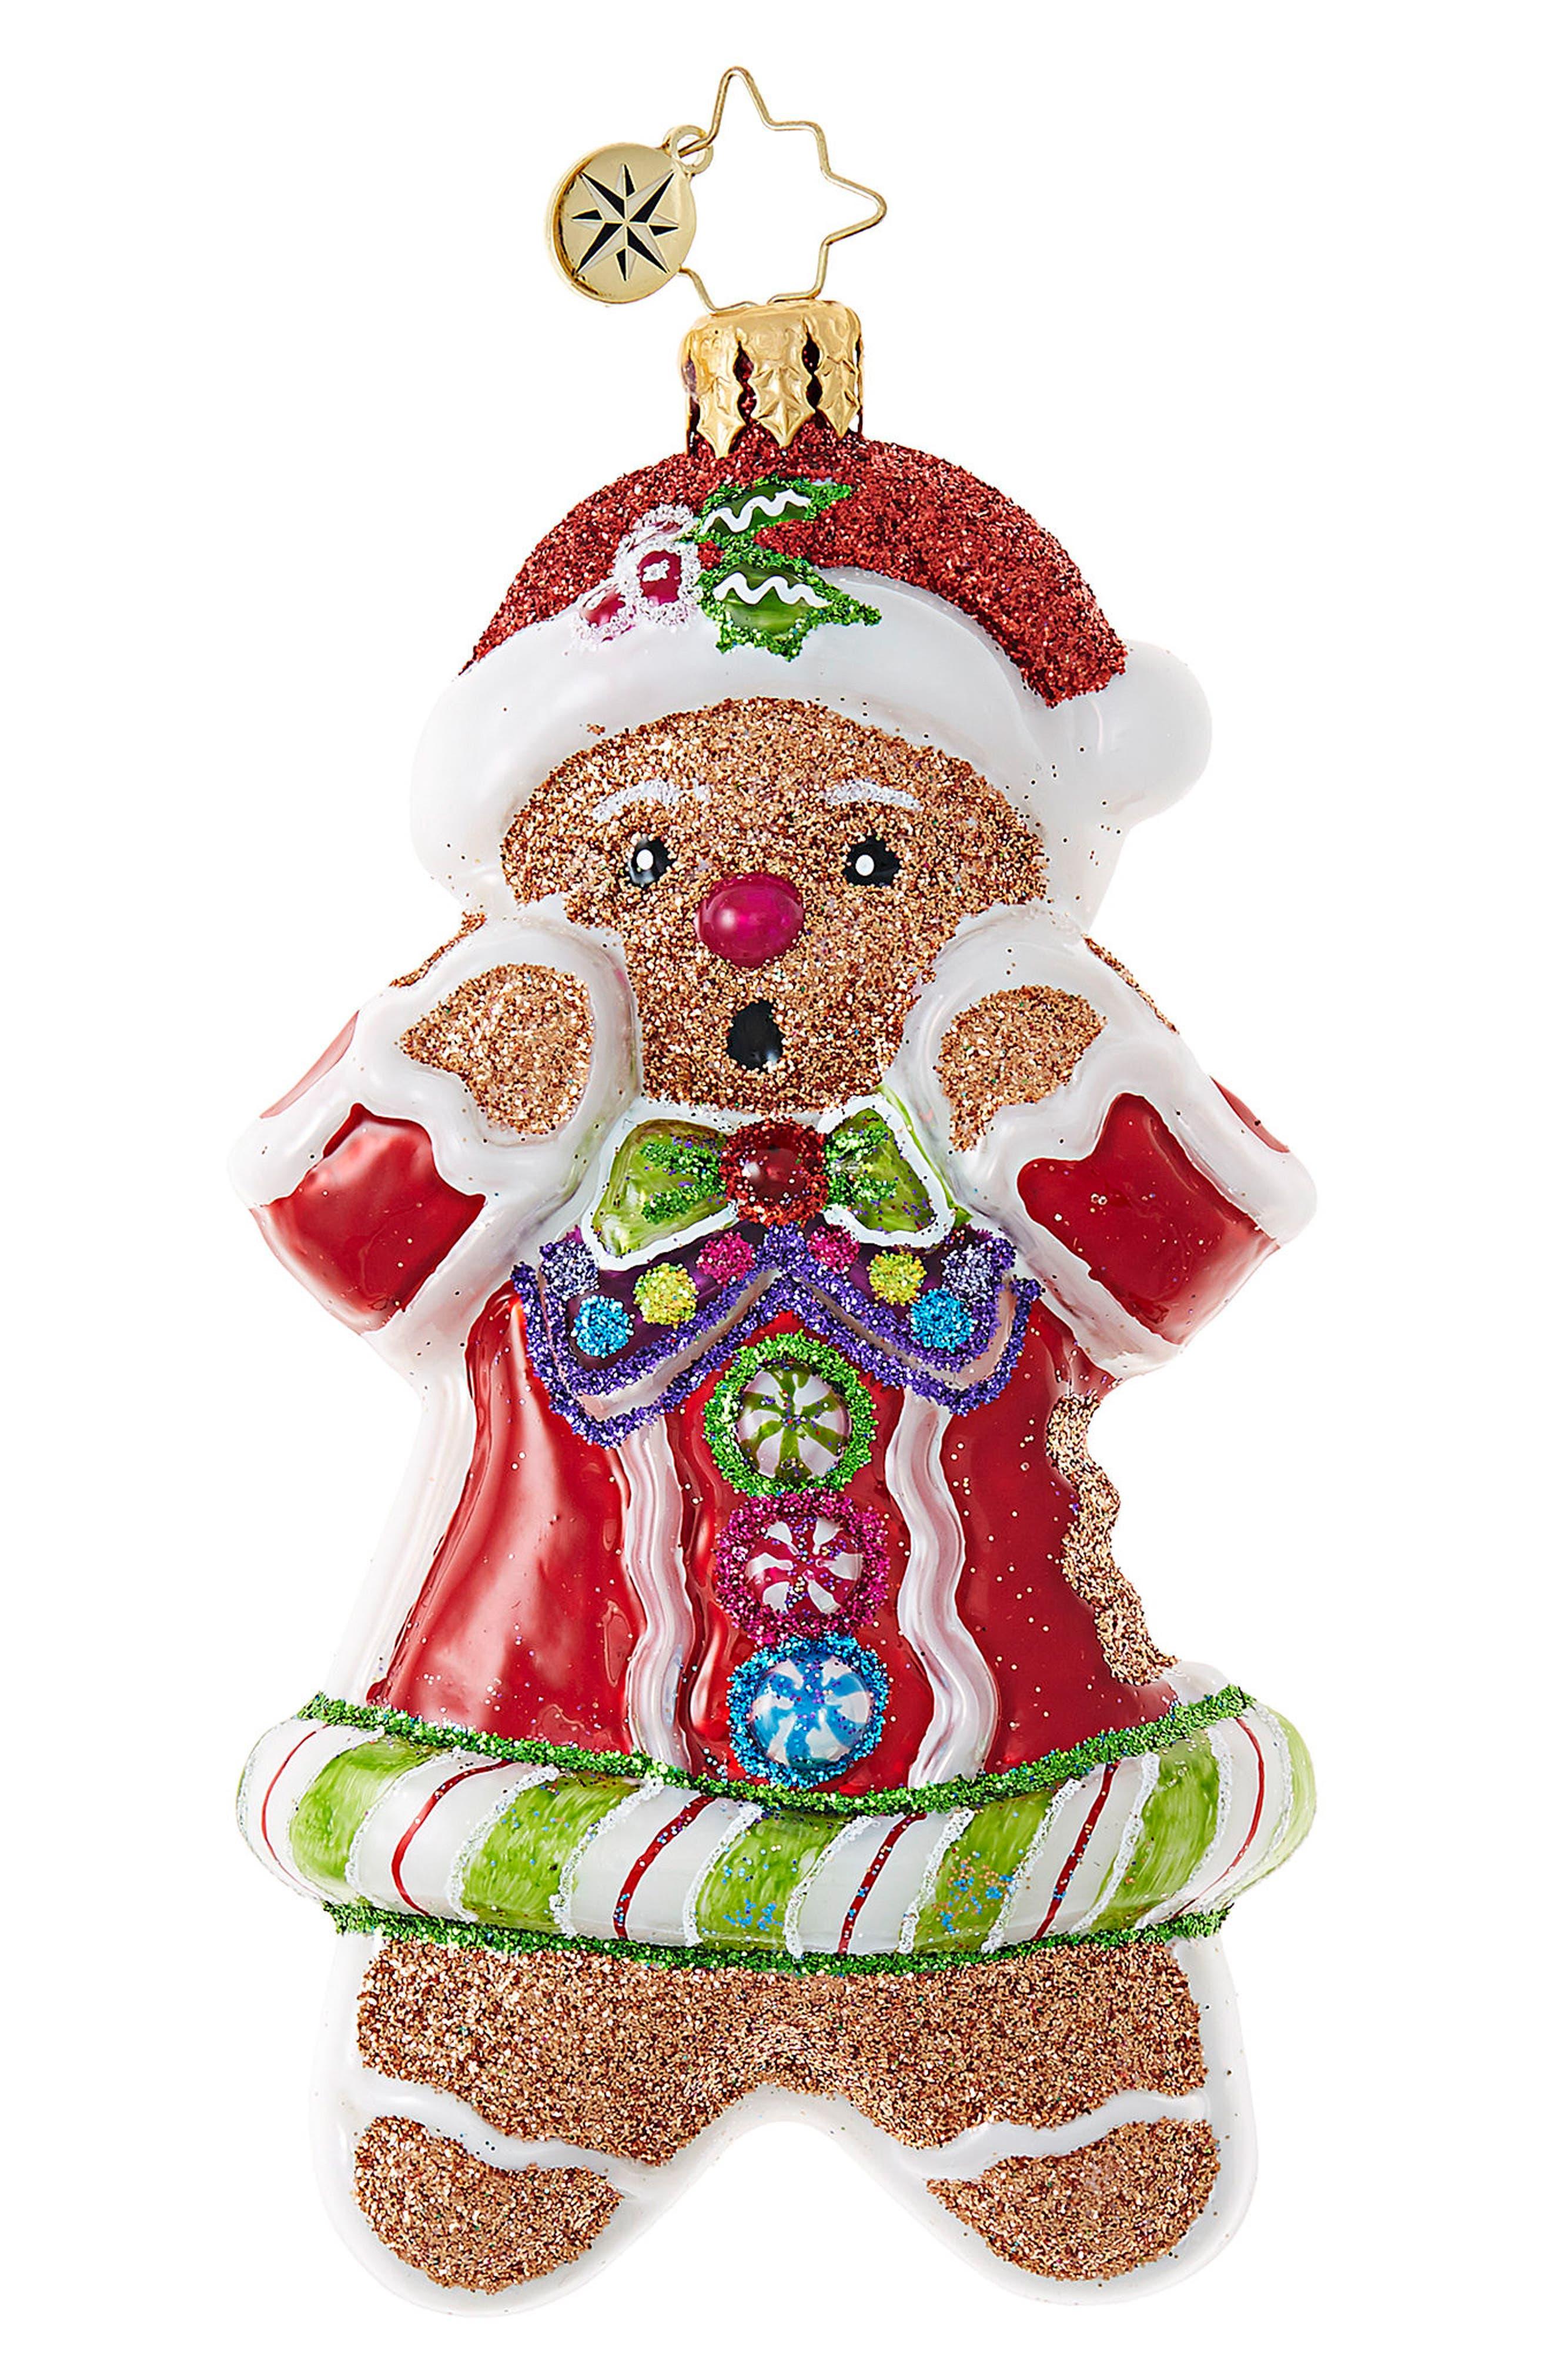 Just One Bite Gingerbread Man Santa Claus Ornament,                         Main,                         color, Red/ Multi